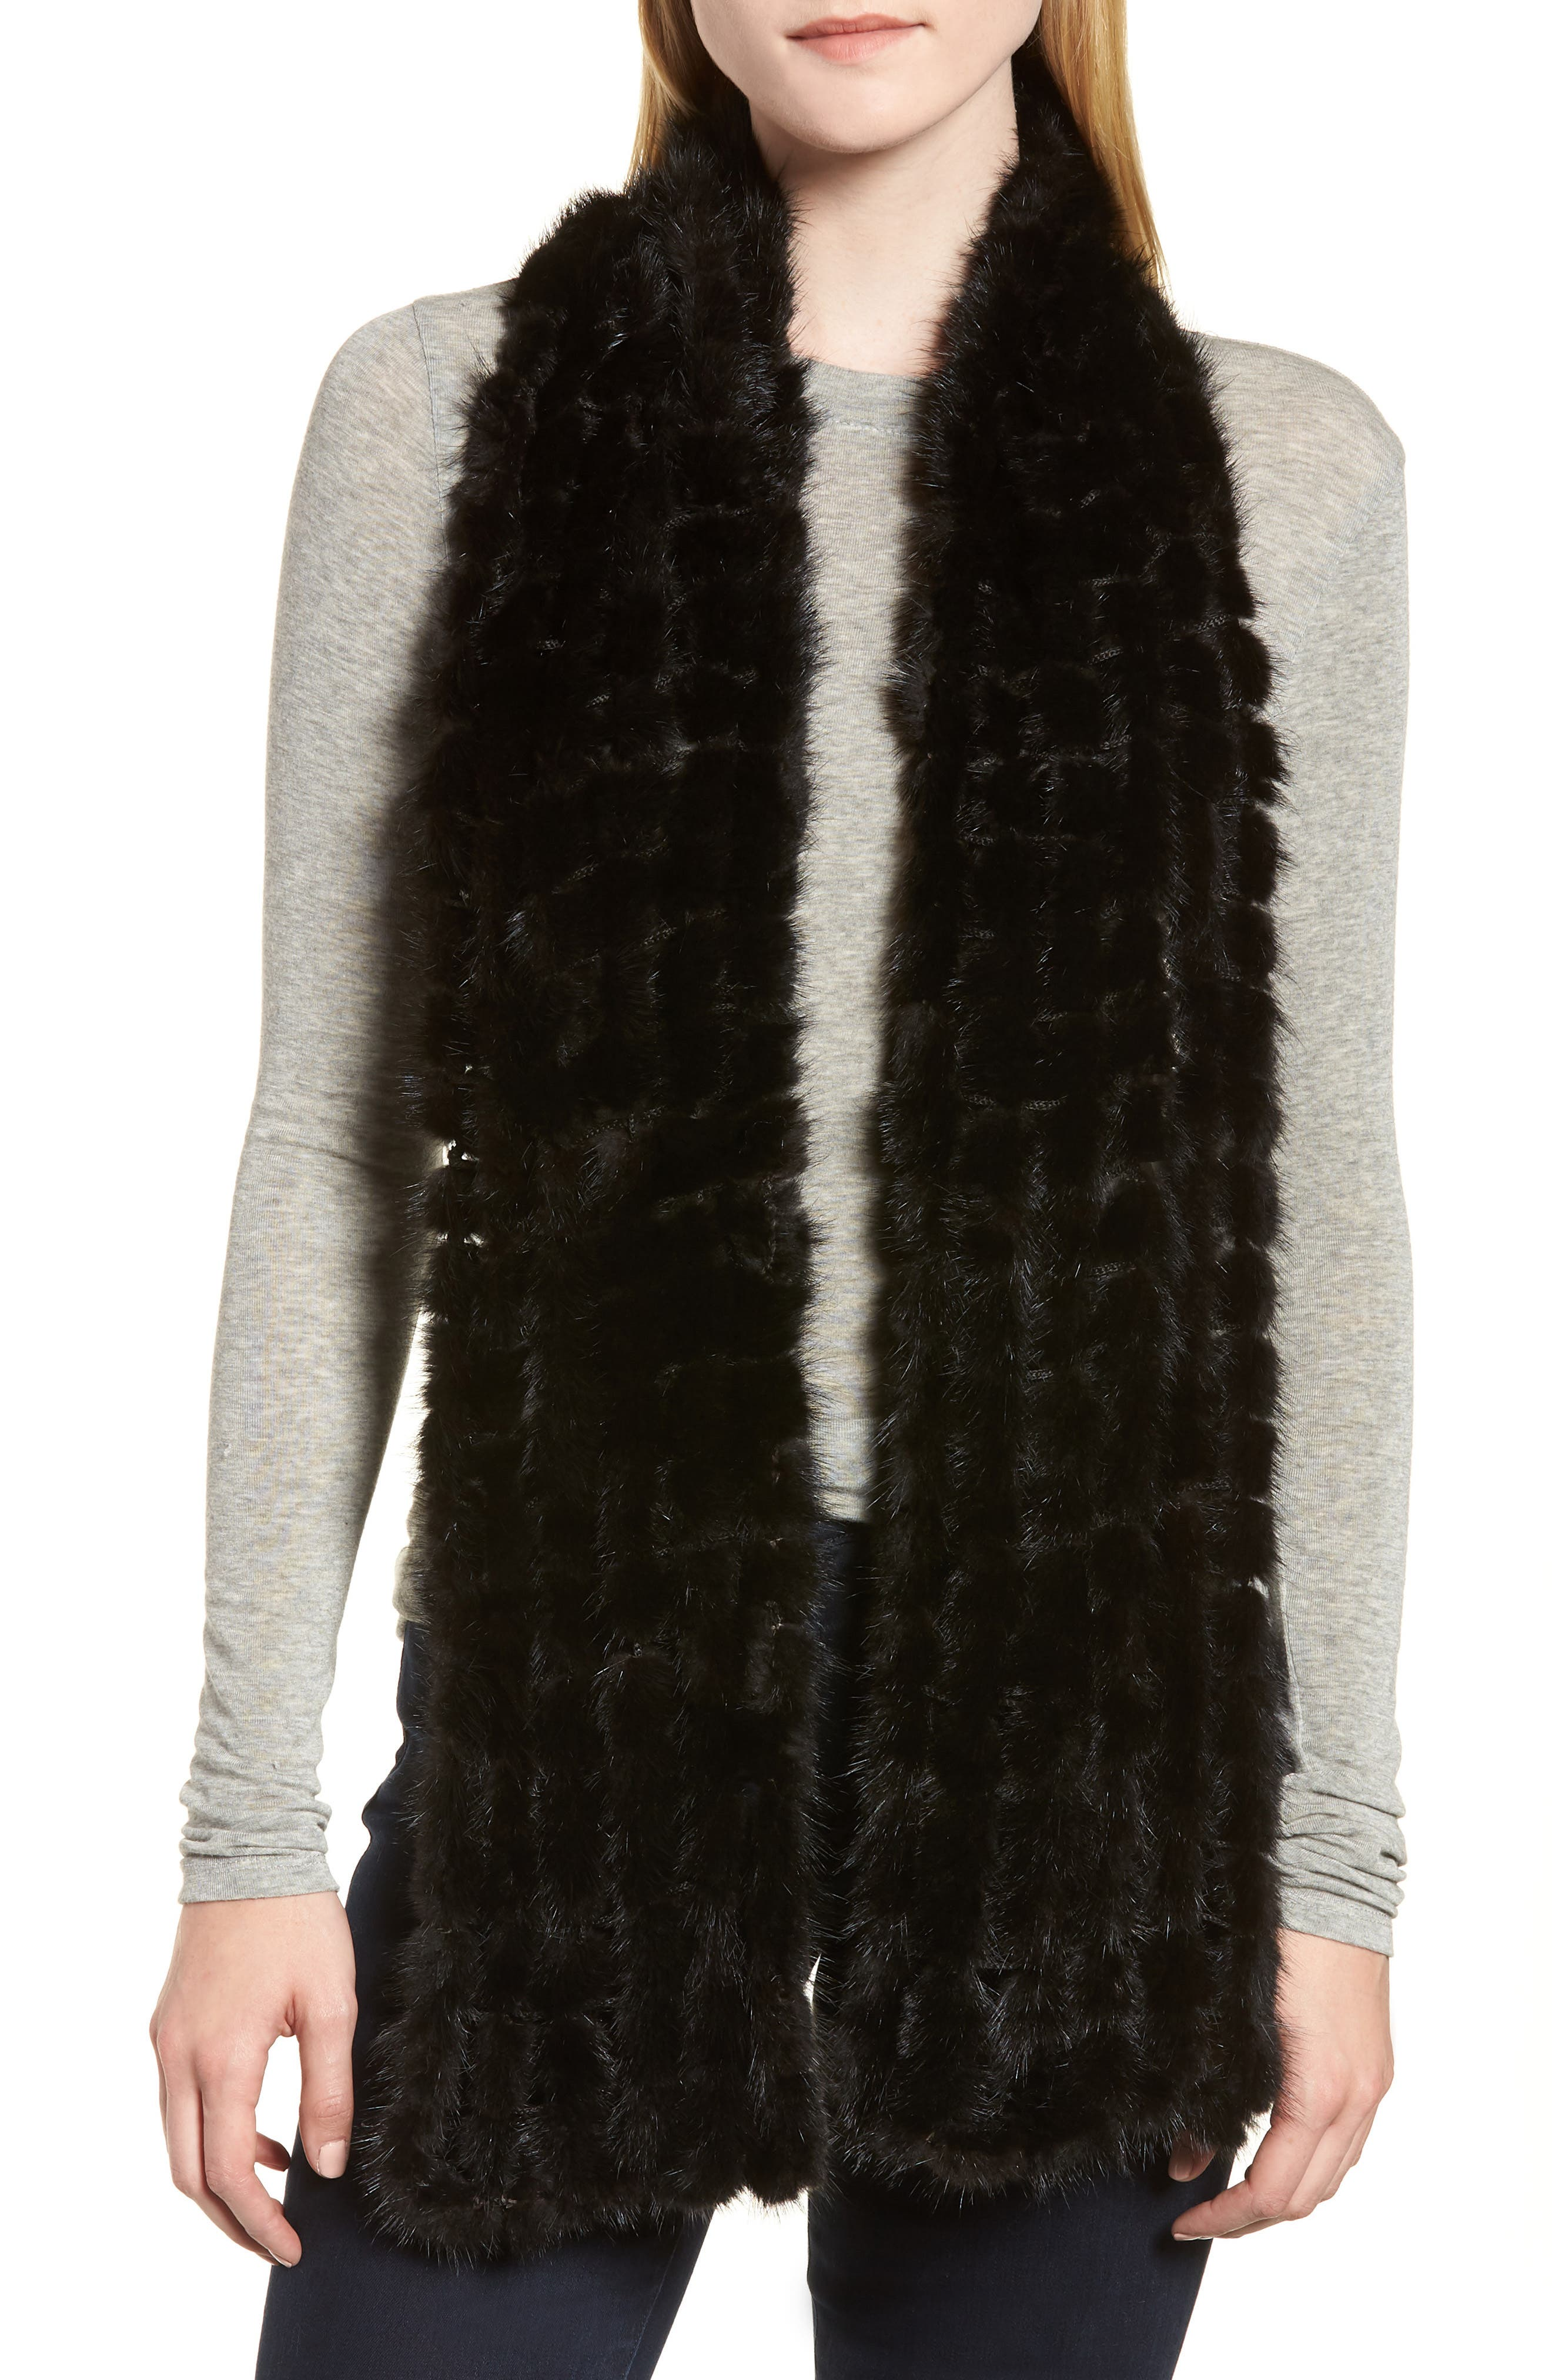 LA FIORENTINA Balled Genuine Mink Fur Muffler, Main, color, 001